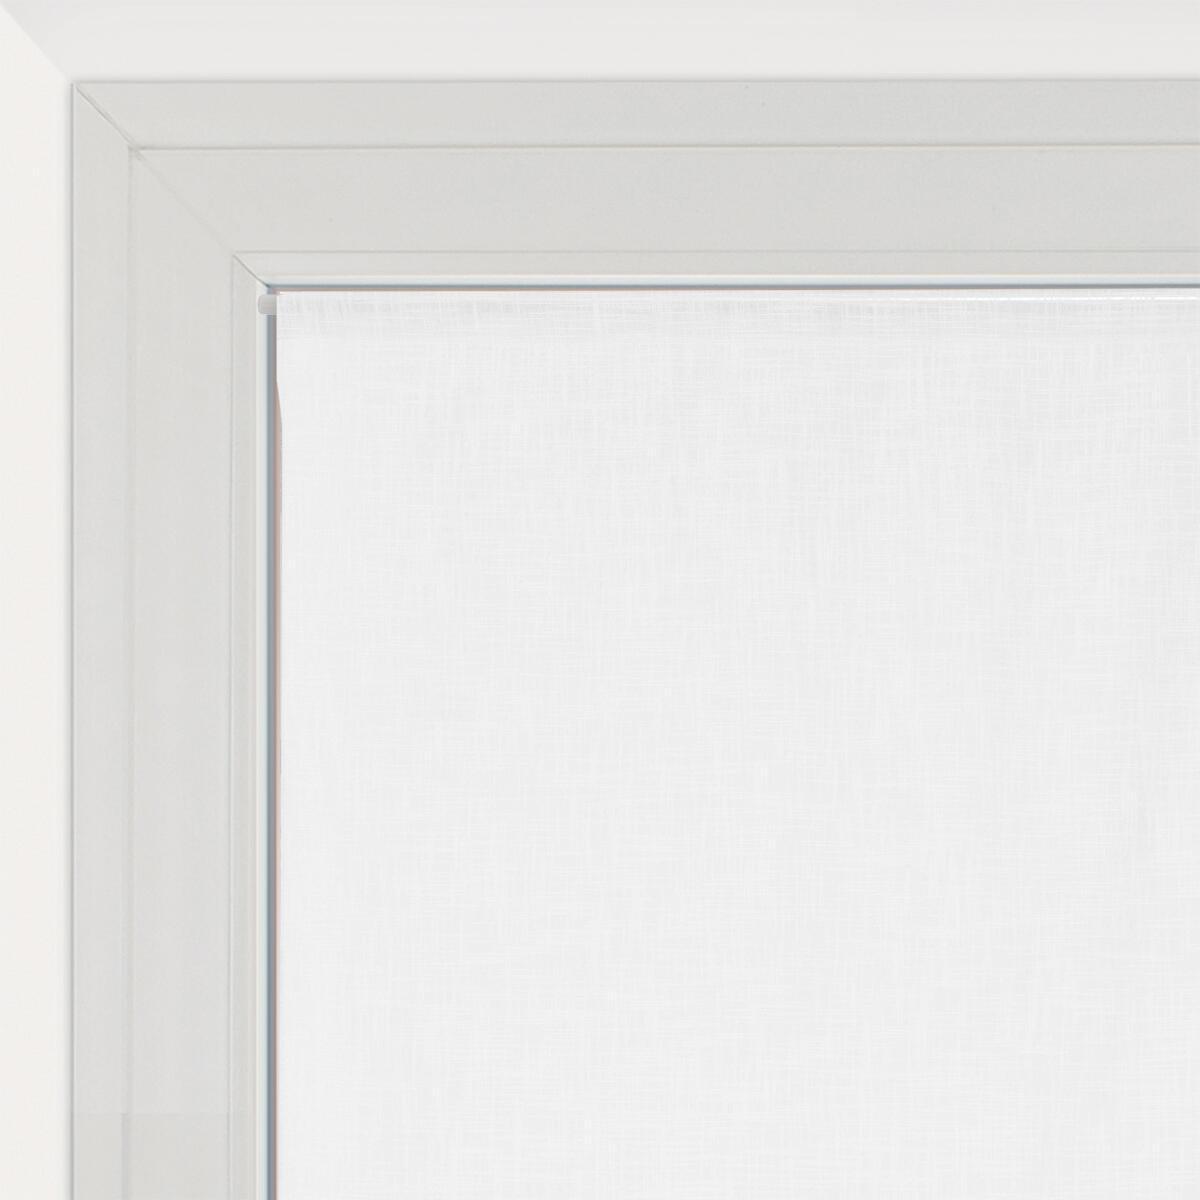 Tendina vetro Infini bianco tunnel 60 x 120 cm - 1